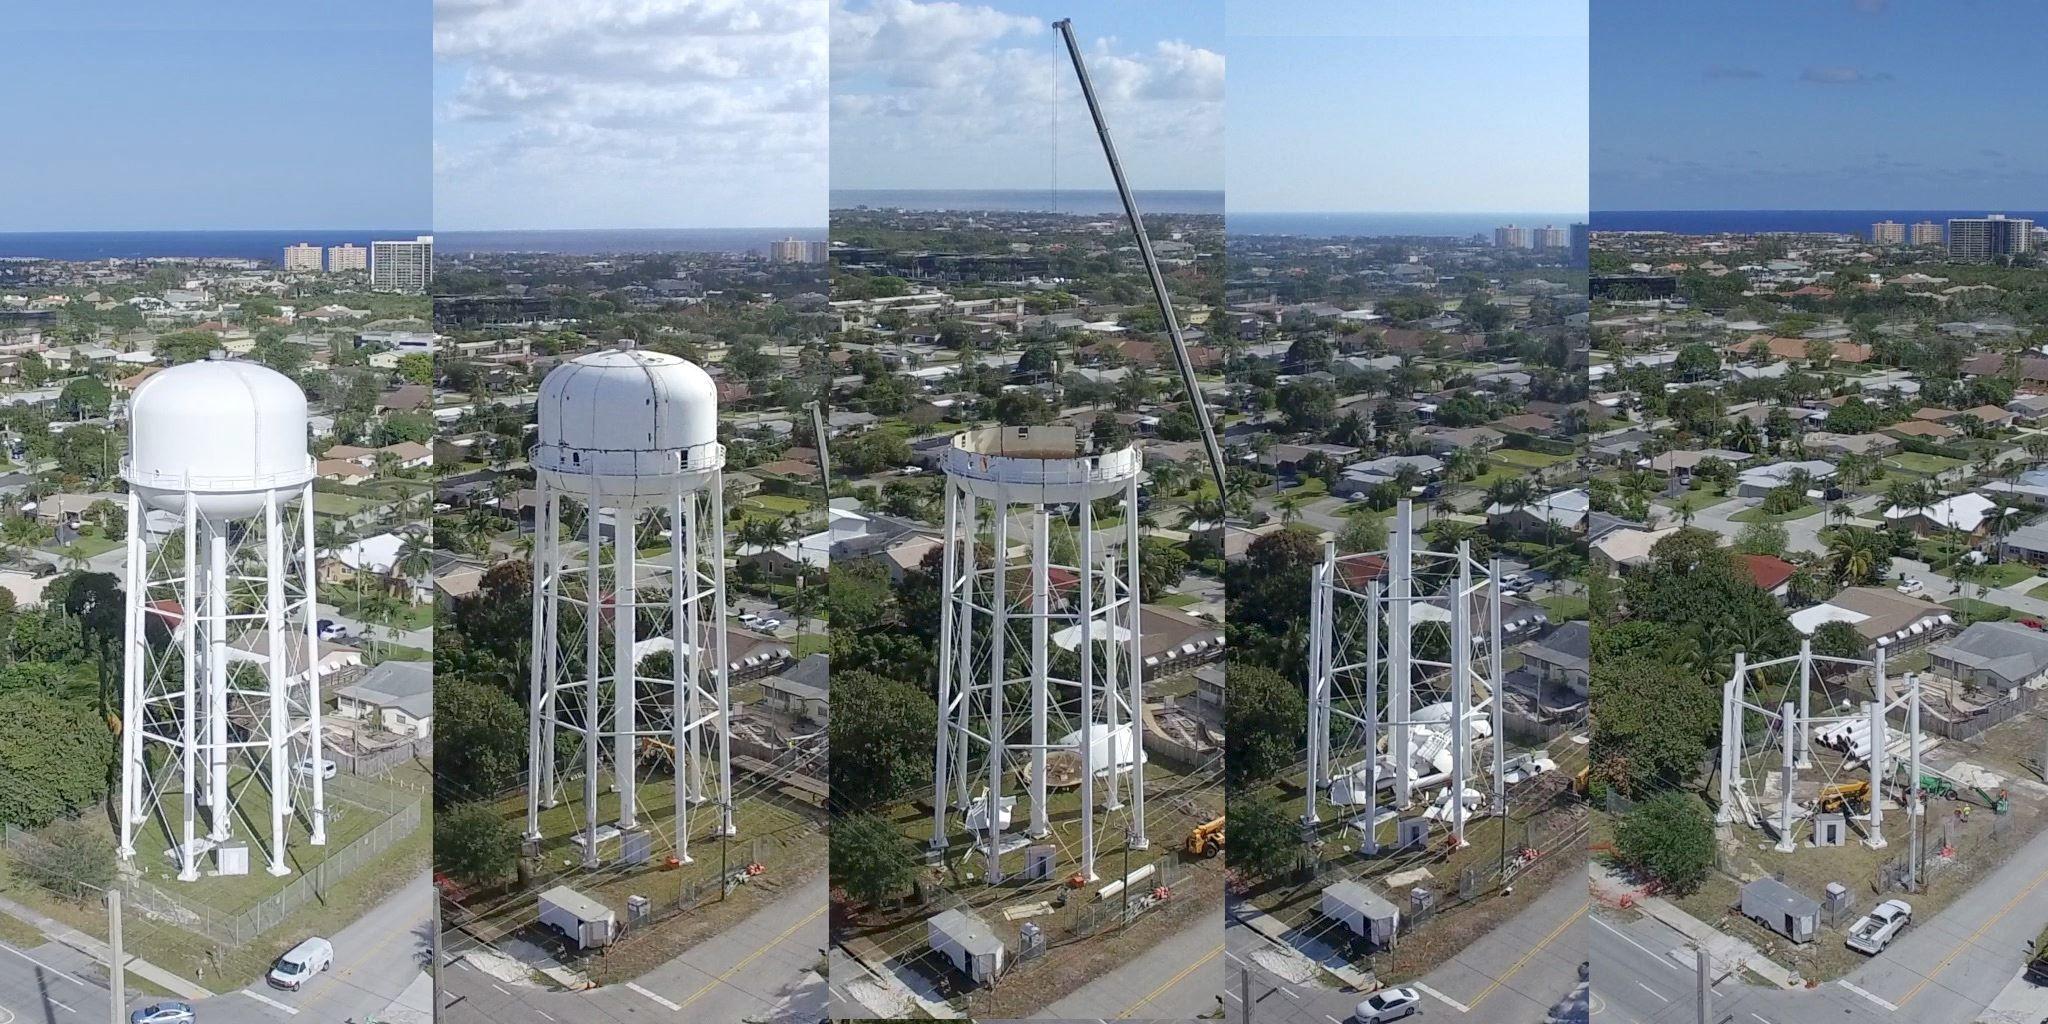 North tower north tower water tower tower